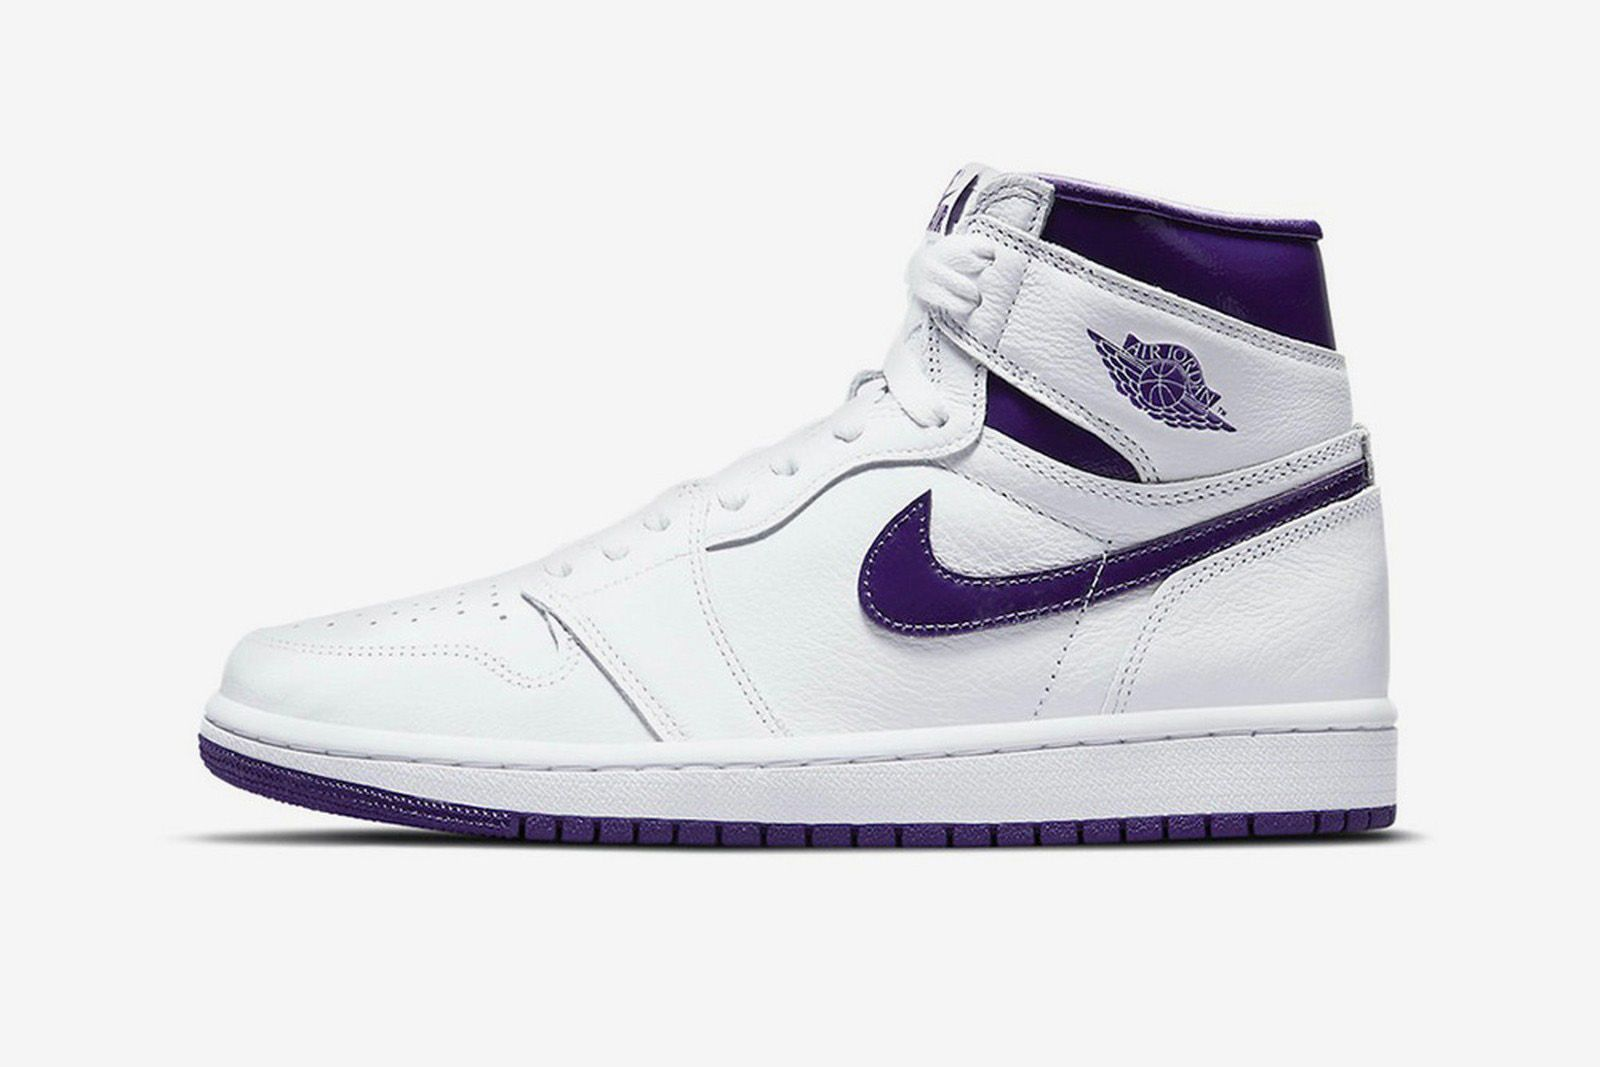 air-jordan-1-court-purple-release-date-price-01